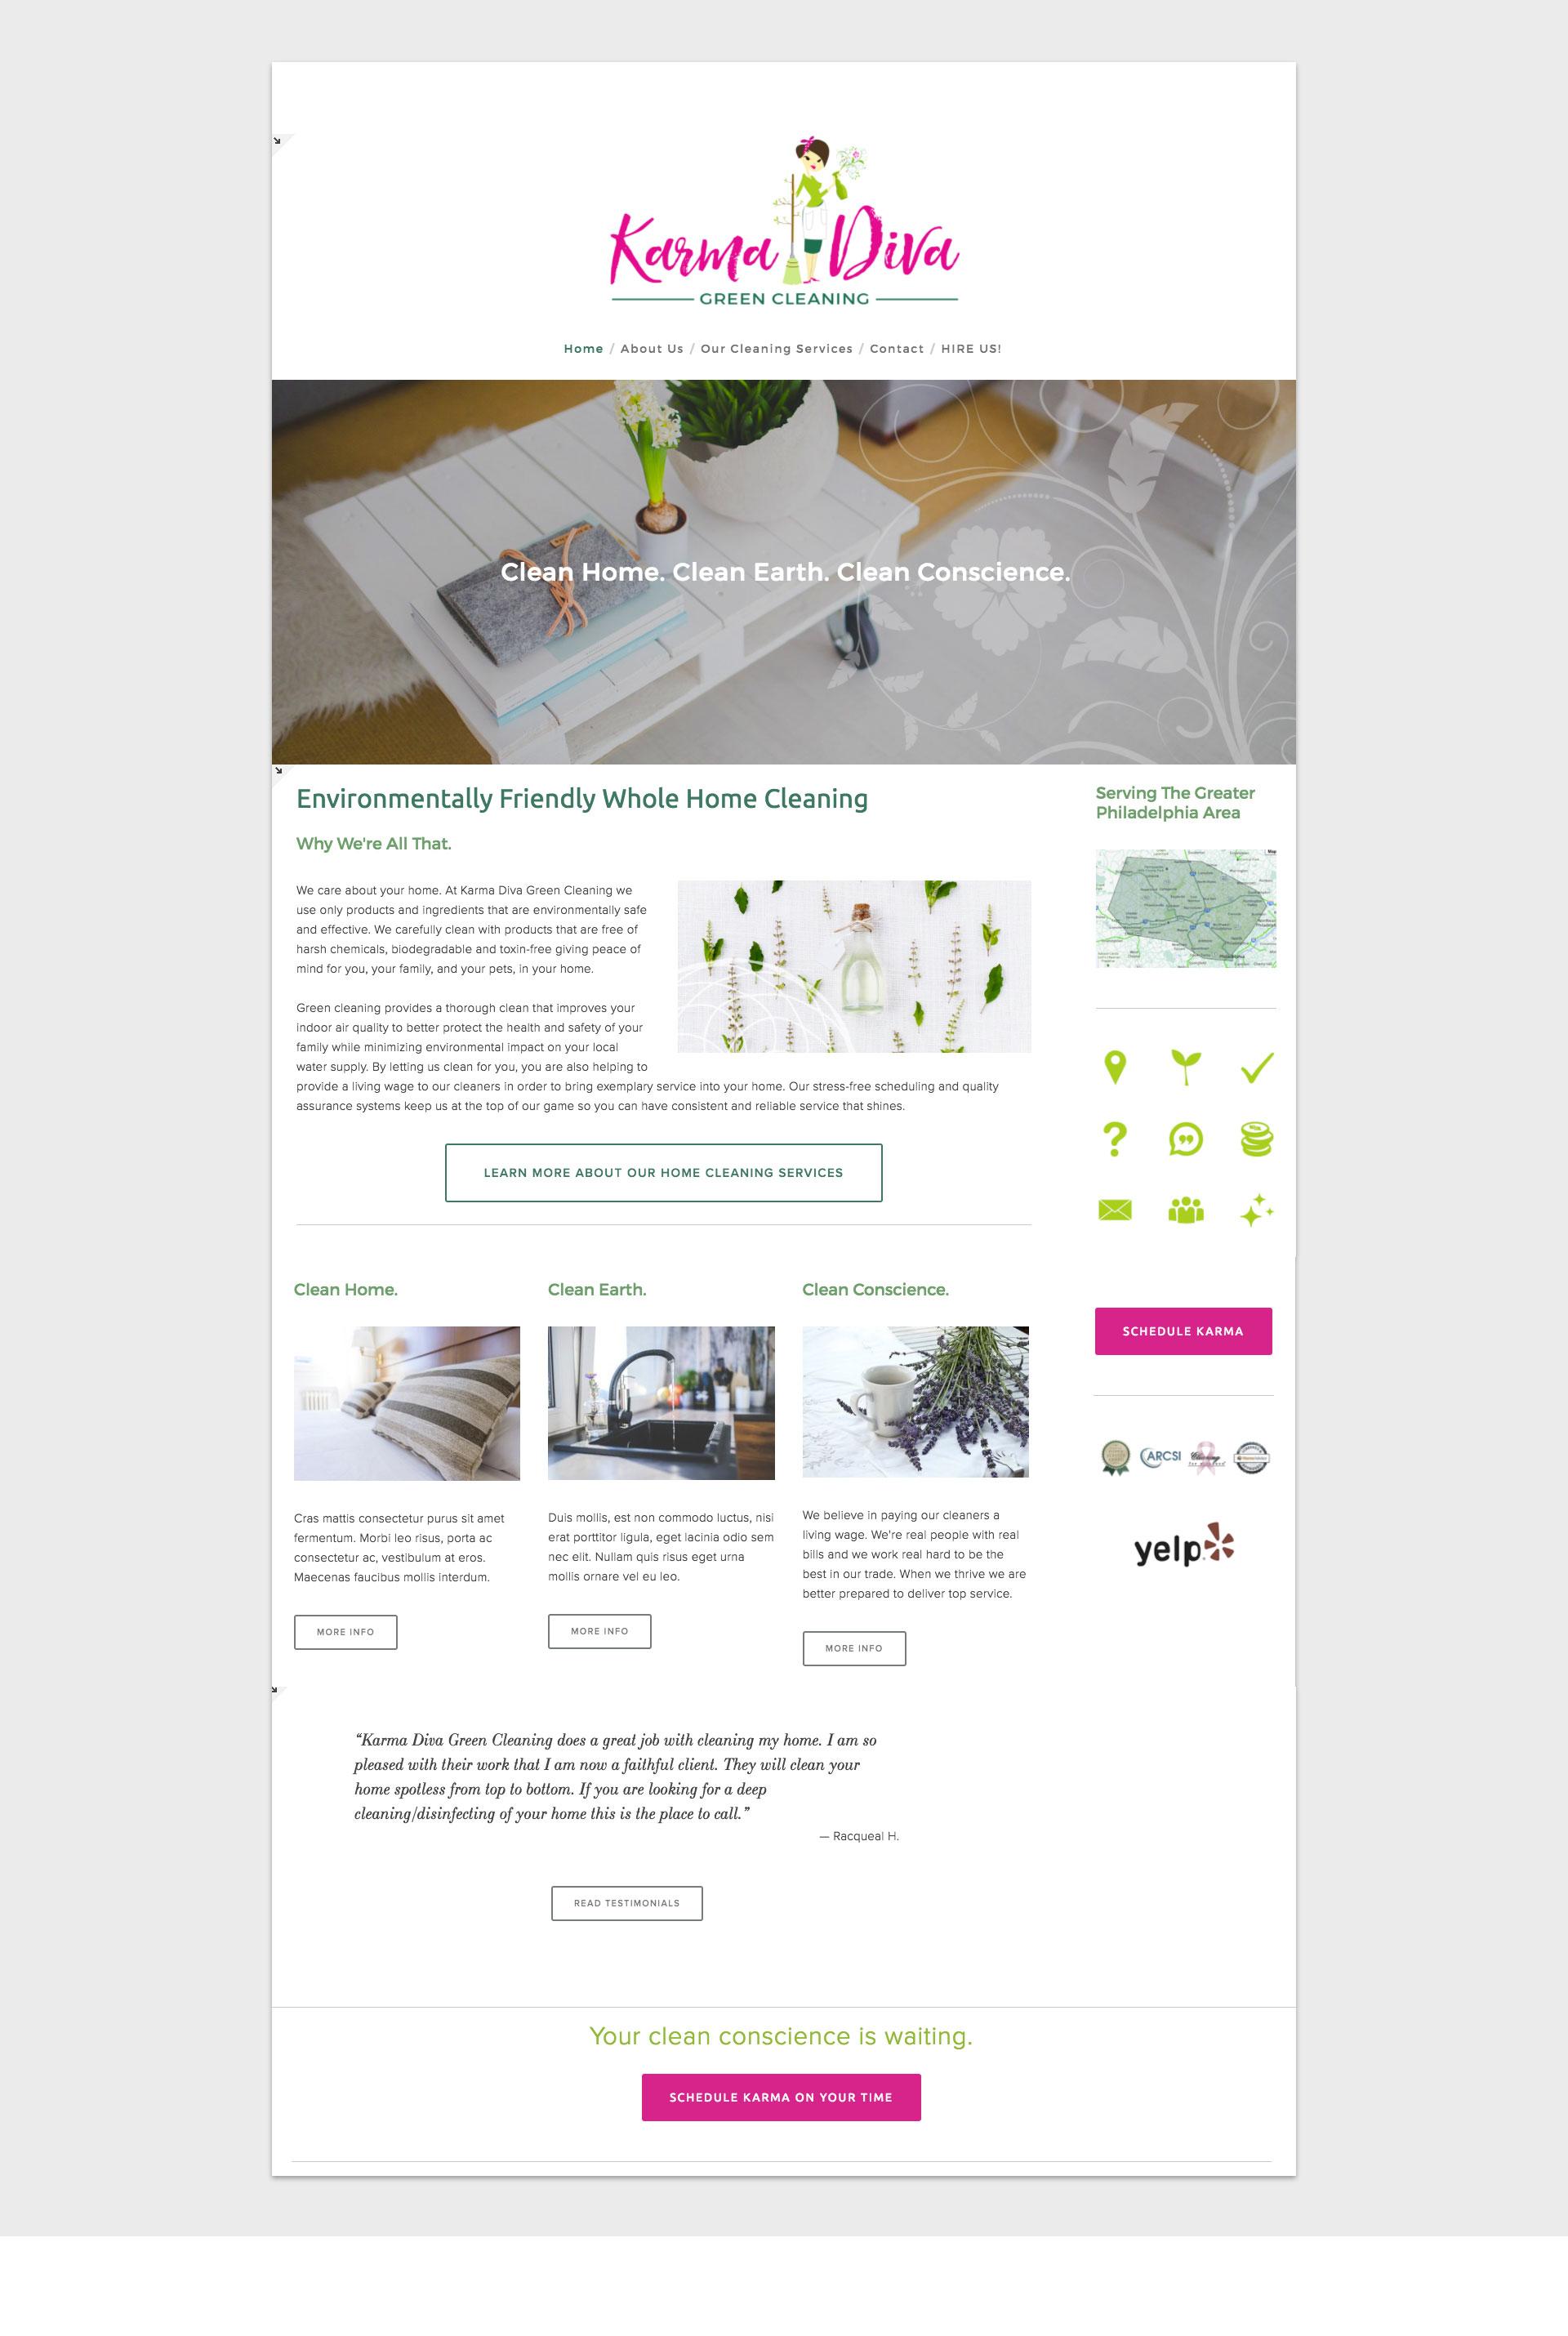 karma-diva-website.jpg